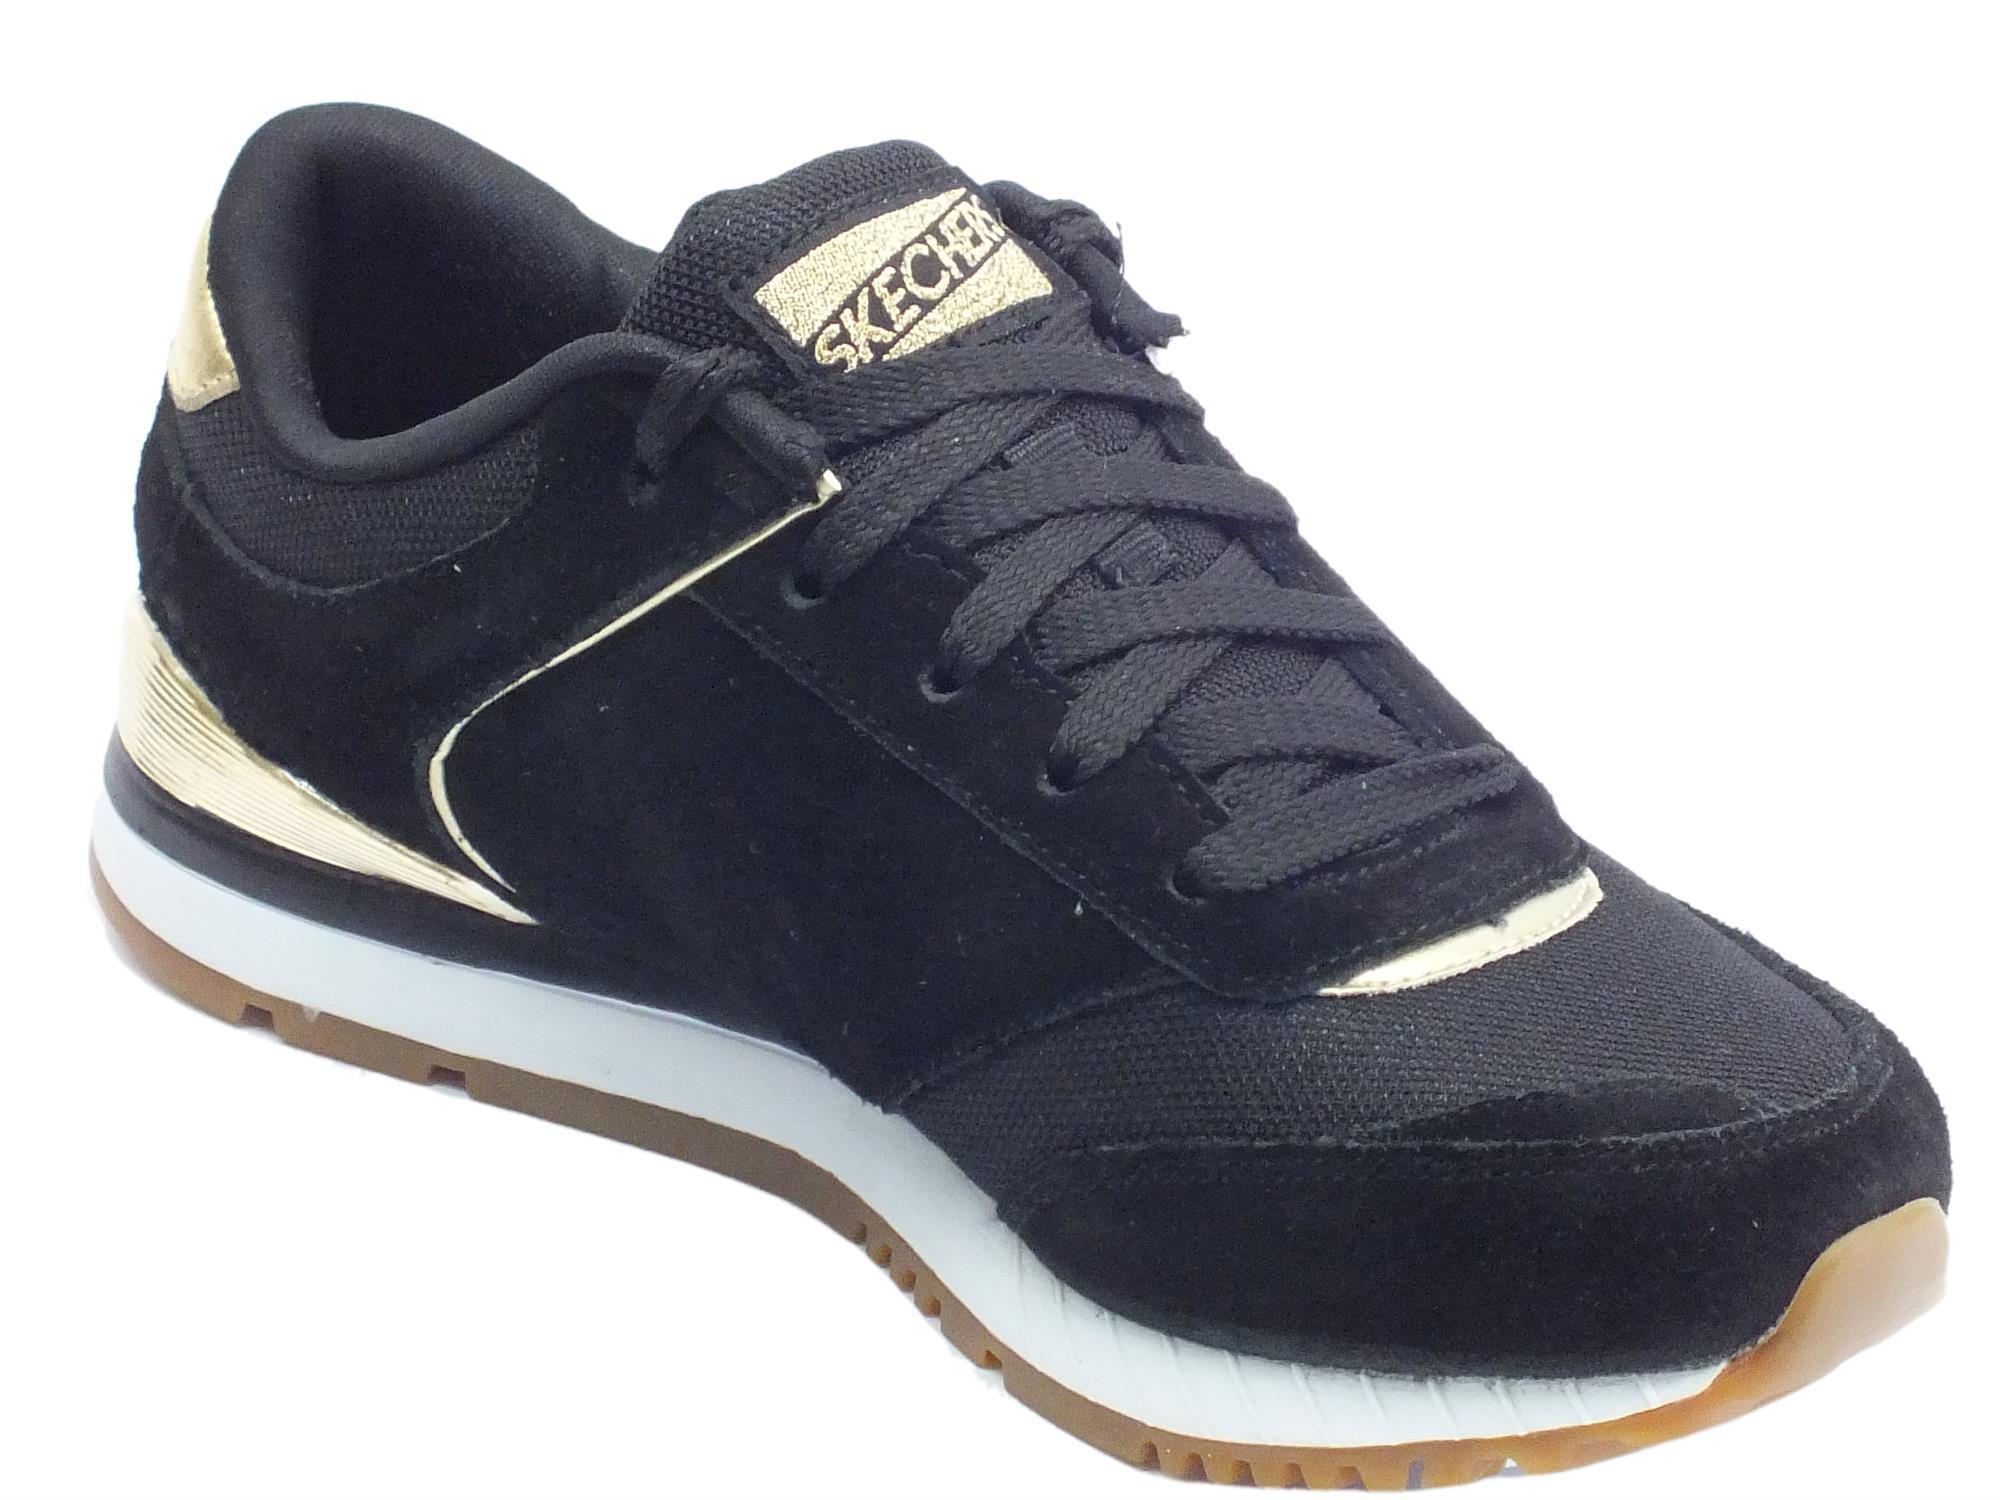 Scarpe sportive donna Skechers Originals tessuto camoscio